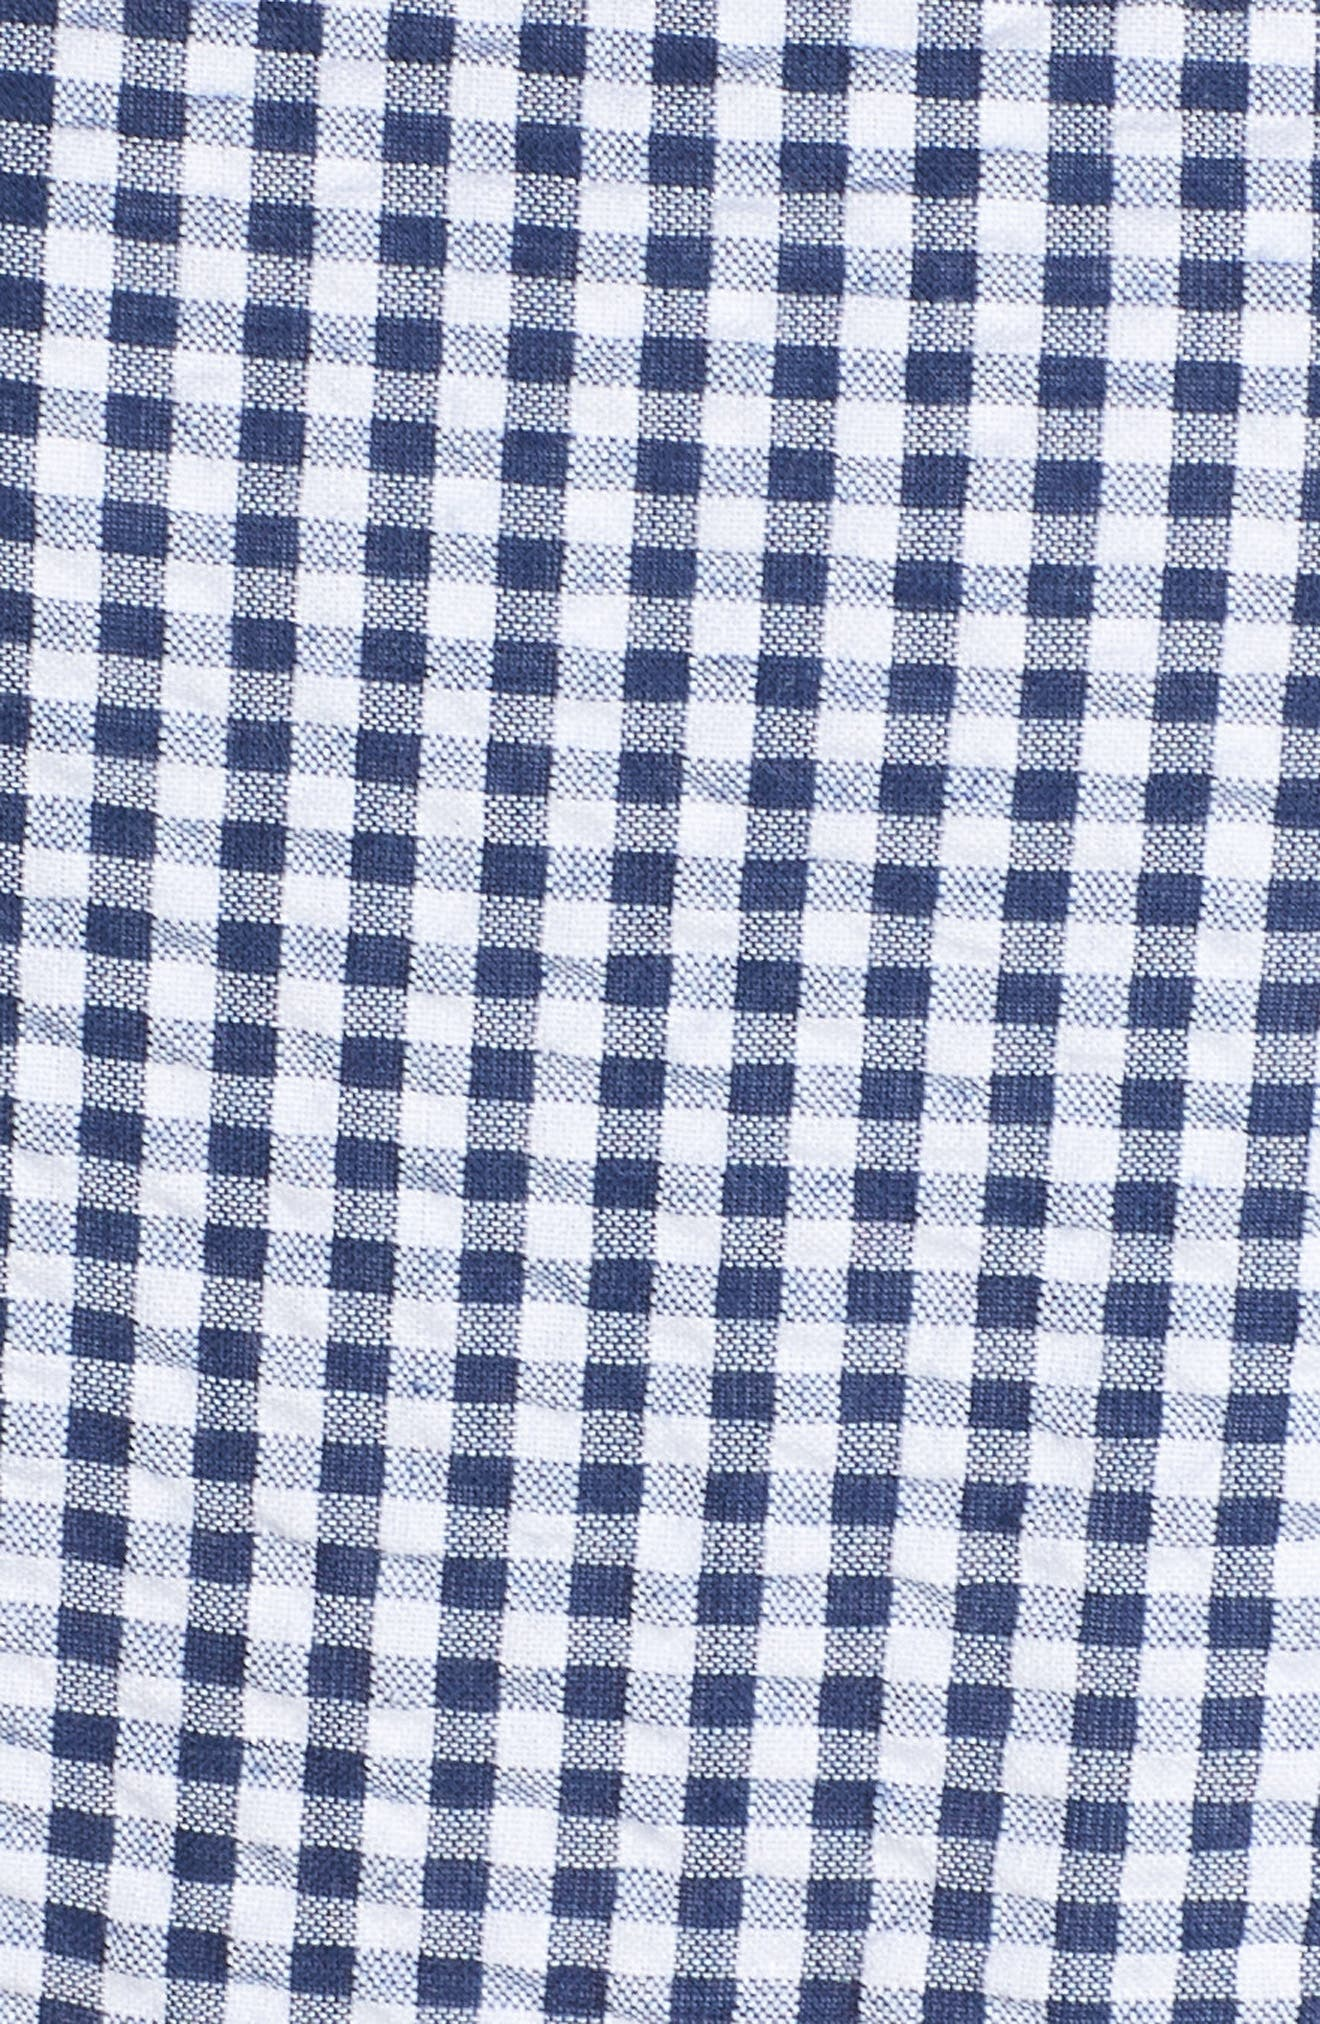 Ruffle Hem Seersucker Check Fit & Flare Dress,                             Alternate thumbnail 6, color,                             Navy/ Ivory